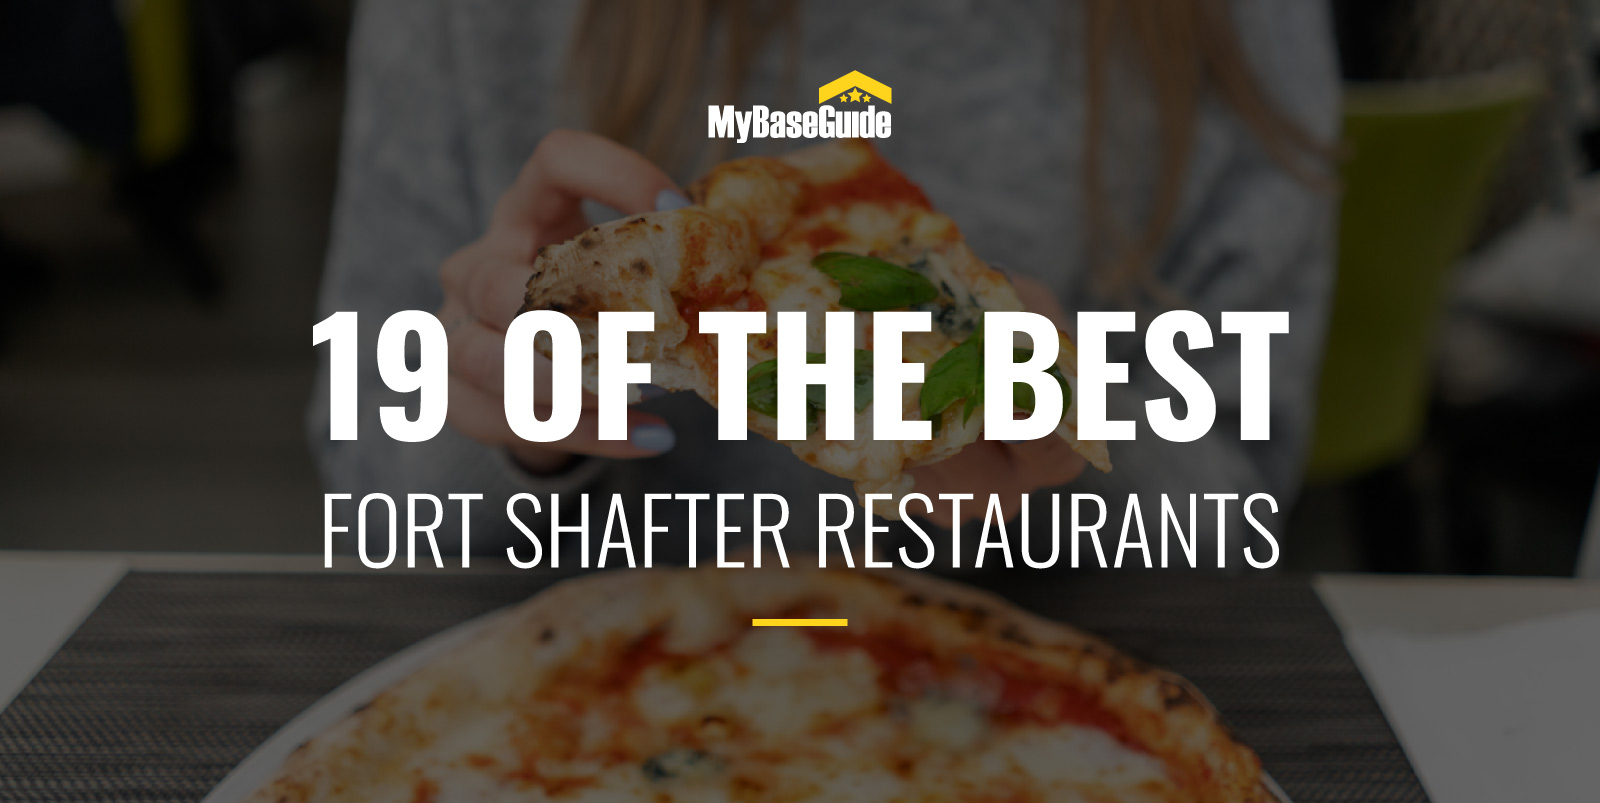 19 of the Best Fort Shafter Restaurants